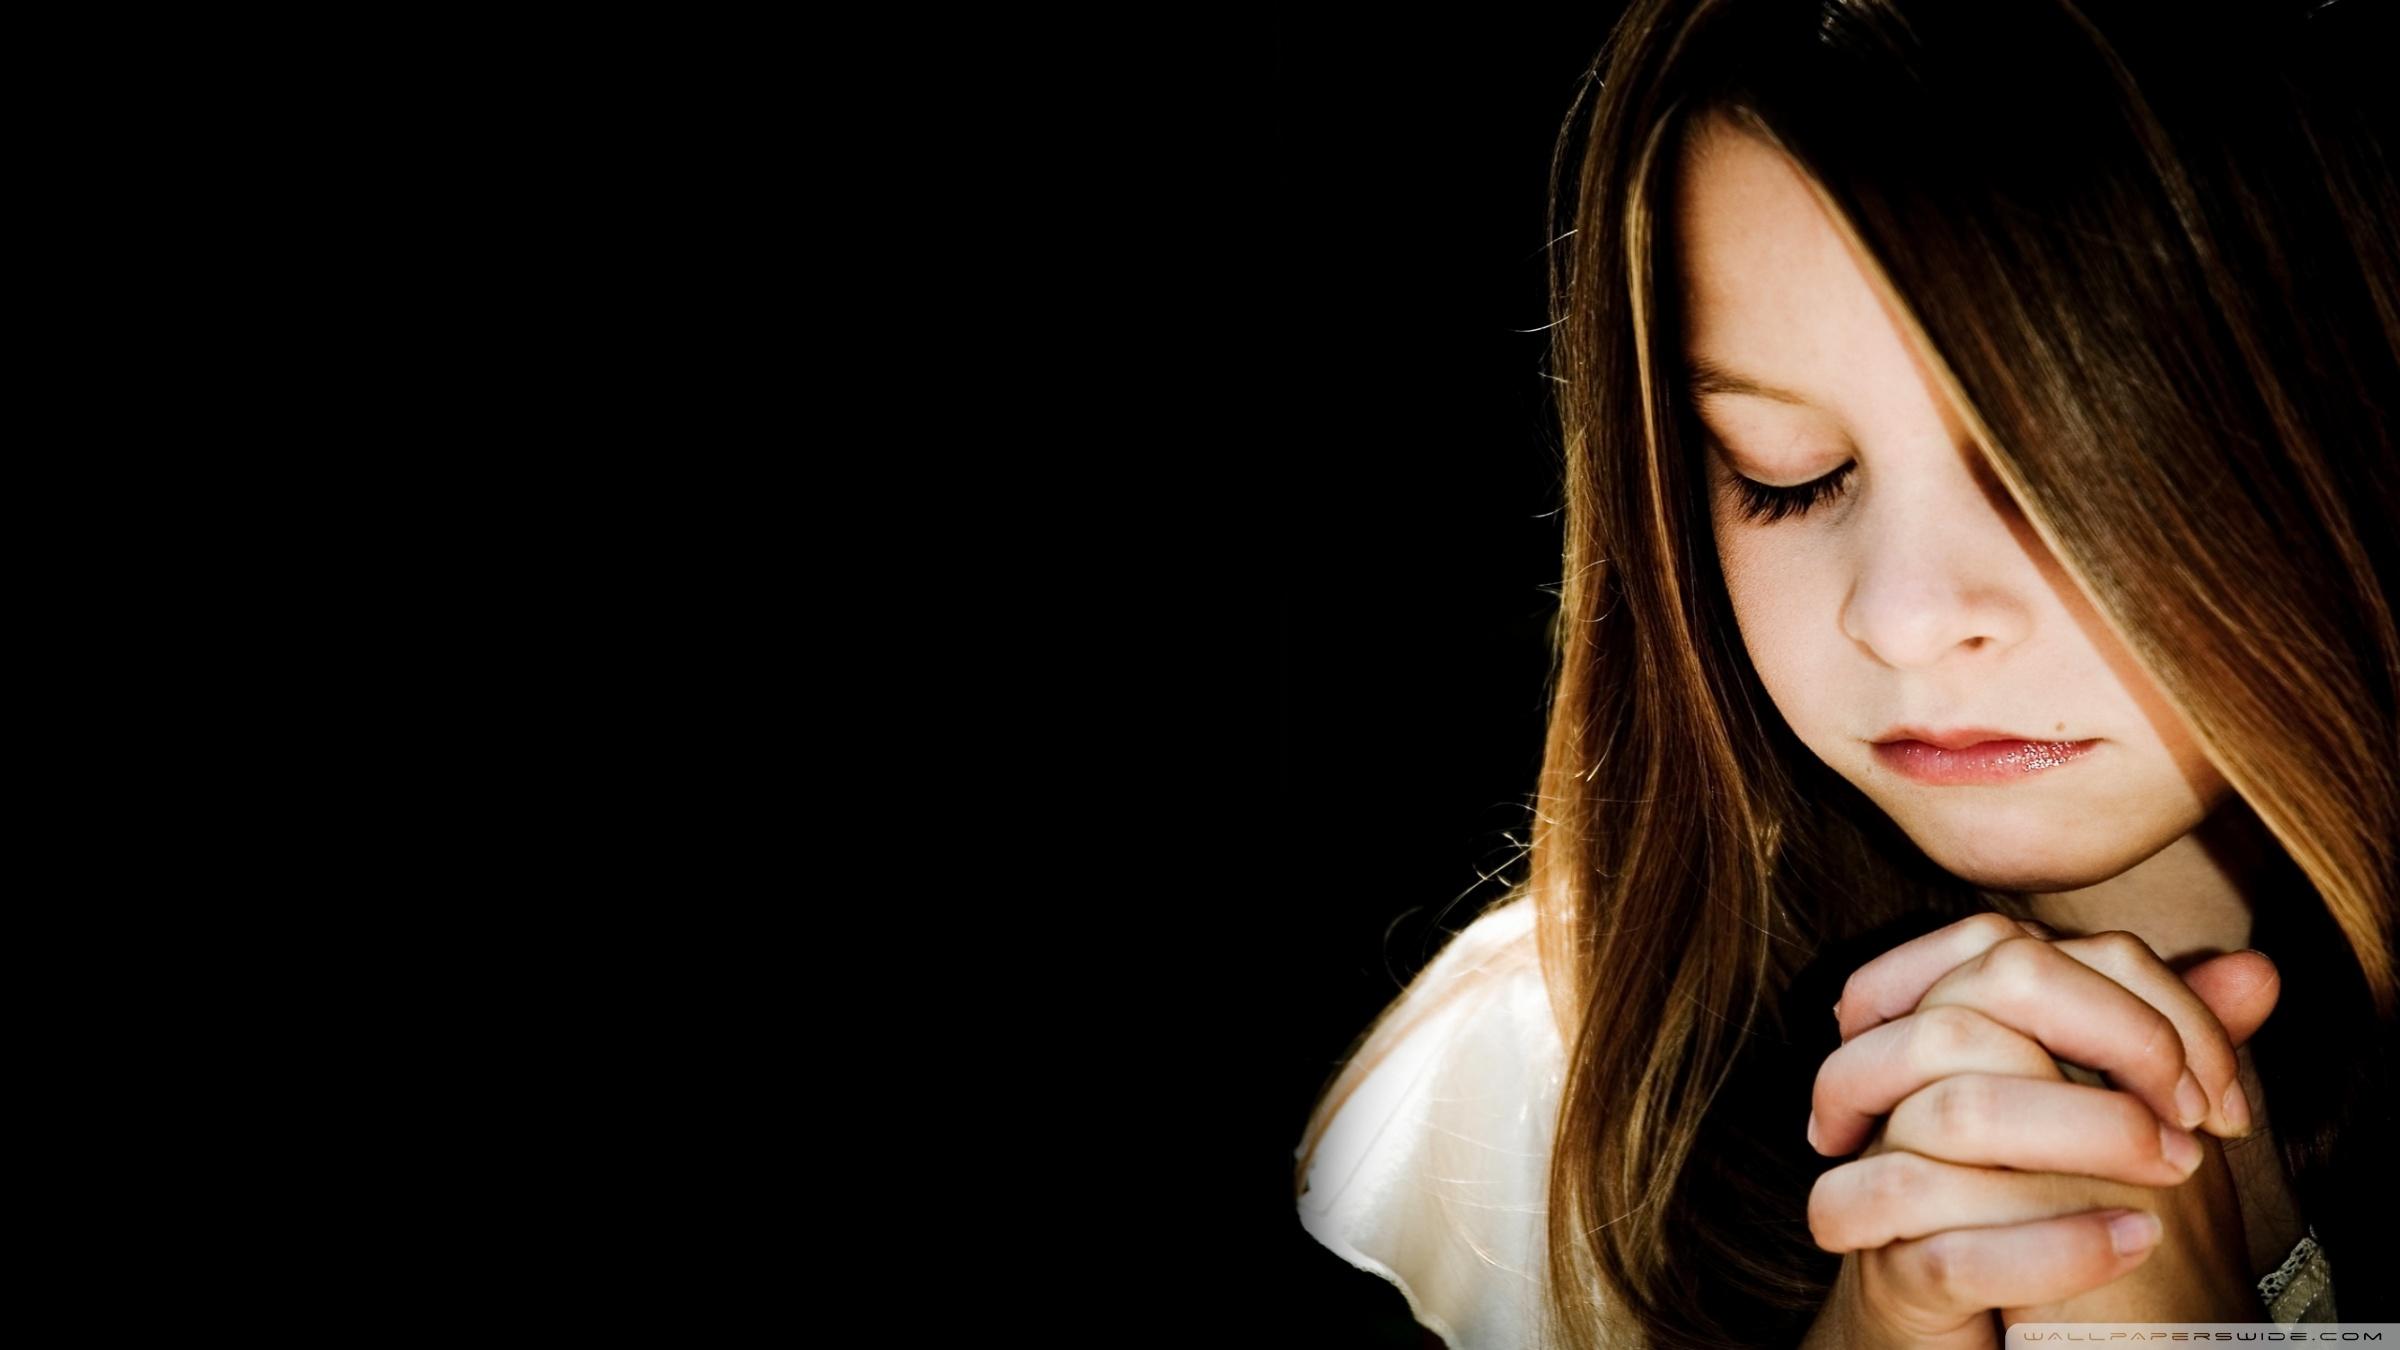 Cute Small Baby Girl Wallpapers Tuntunan Doa Buat Yang Ingin Menerima Tuhan Yesus Kristus